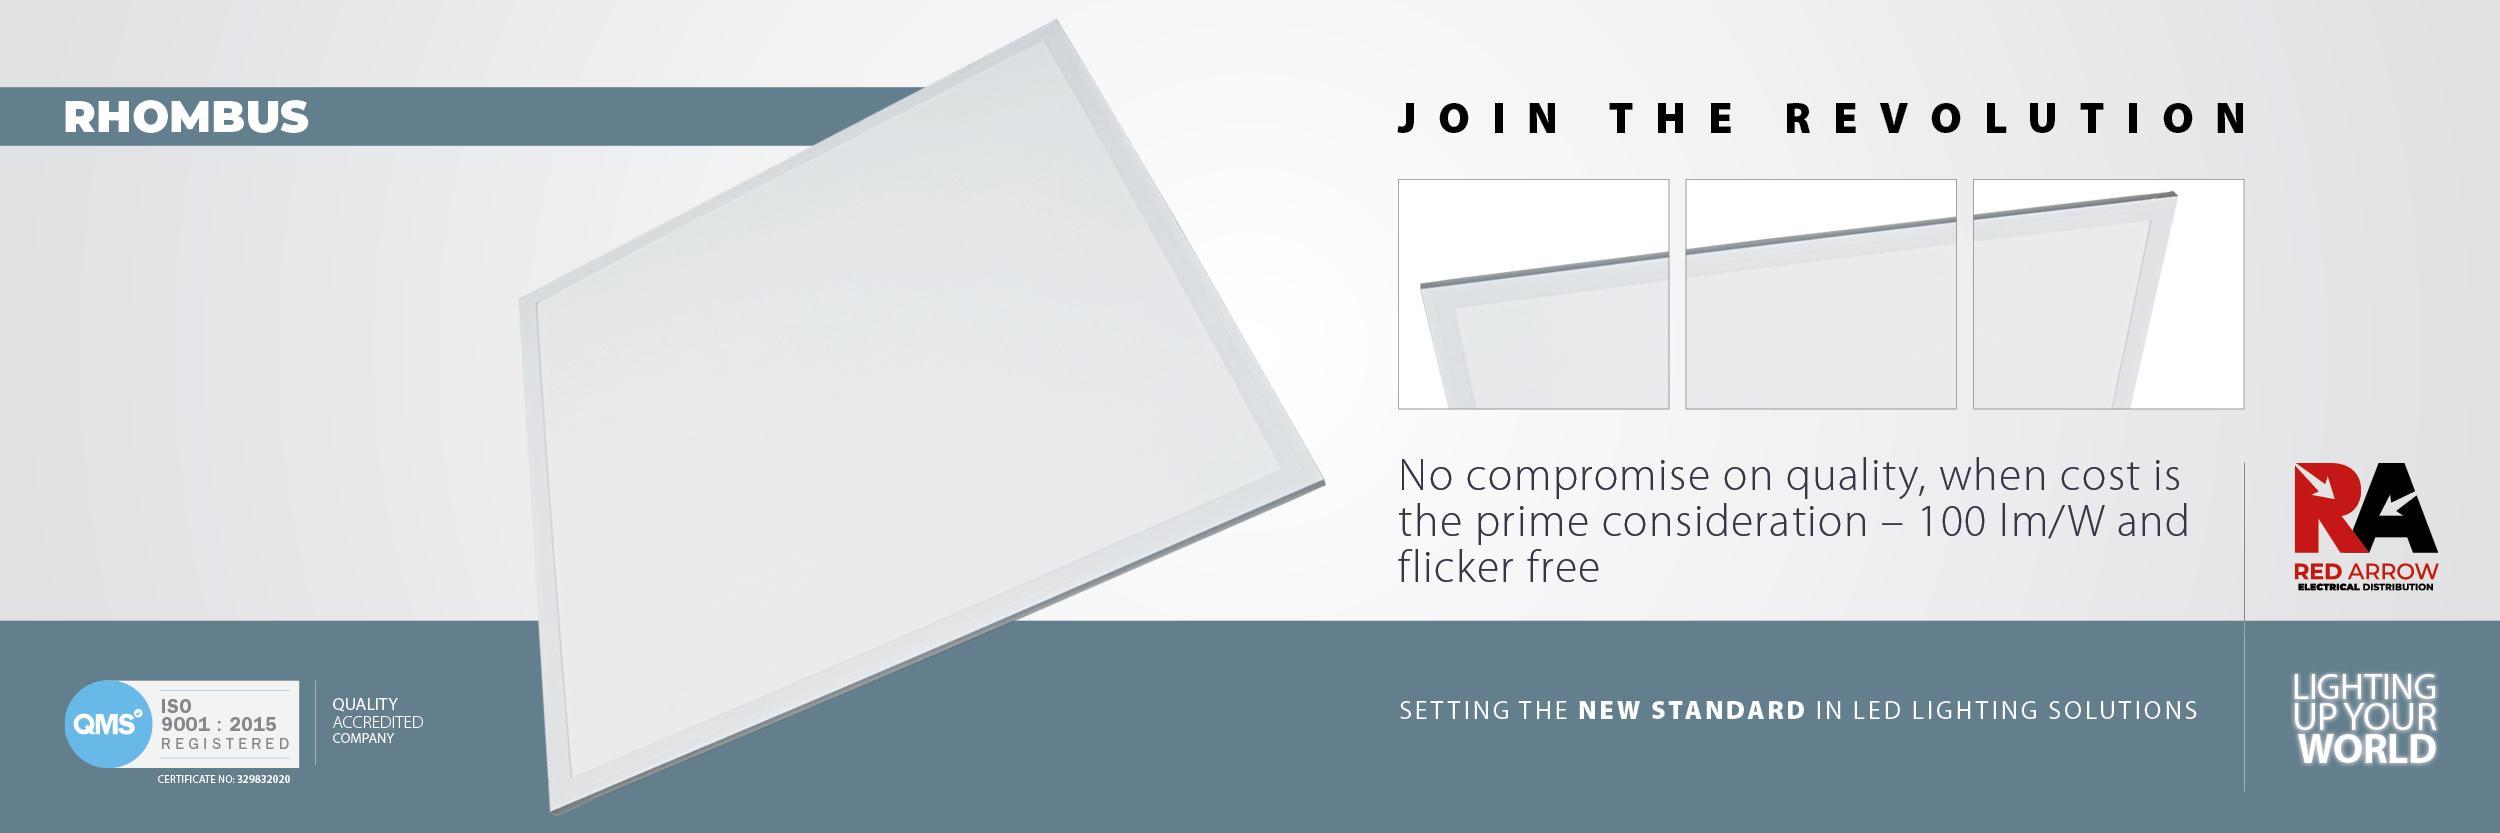 Rhombus Panel Web Banner